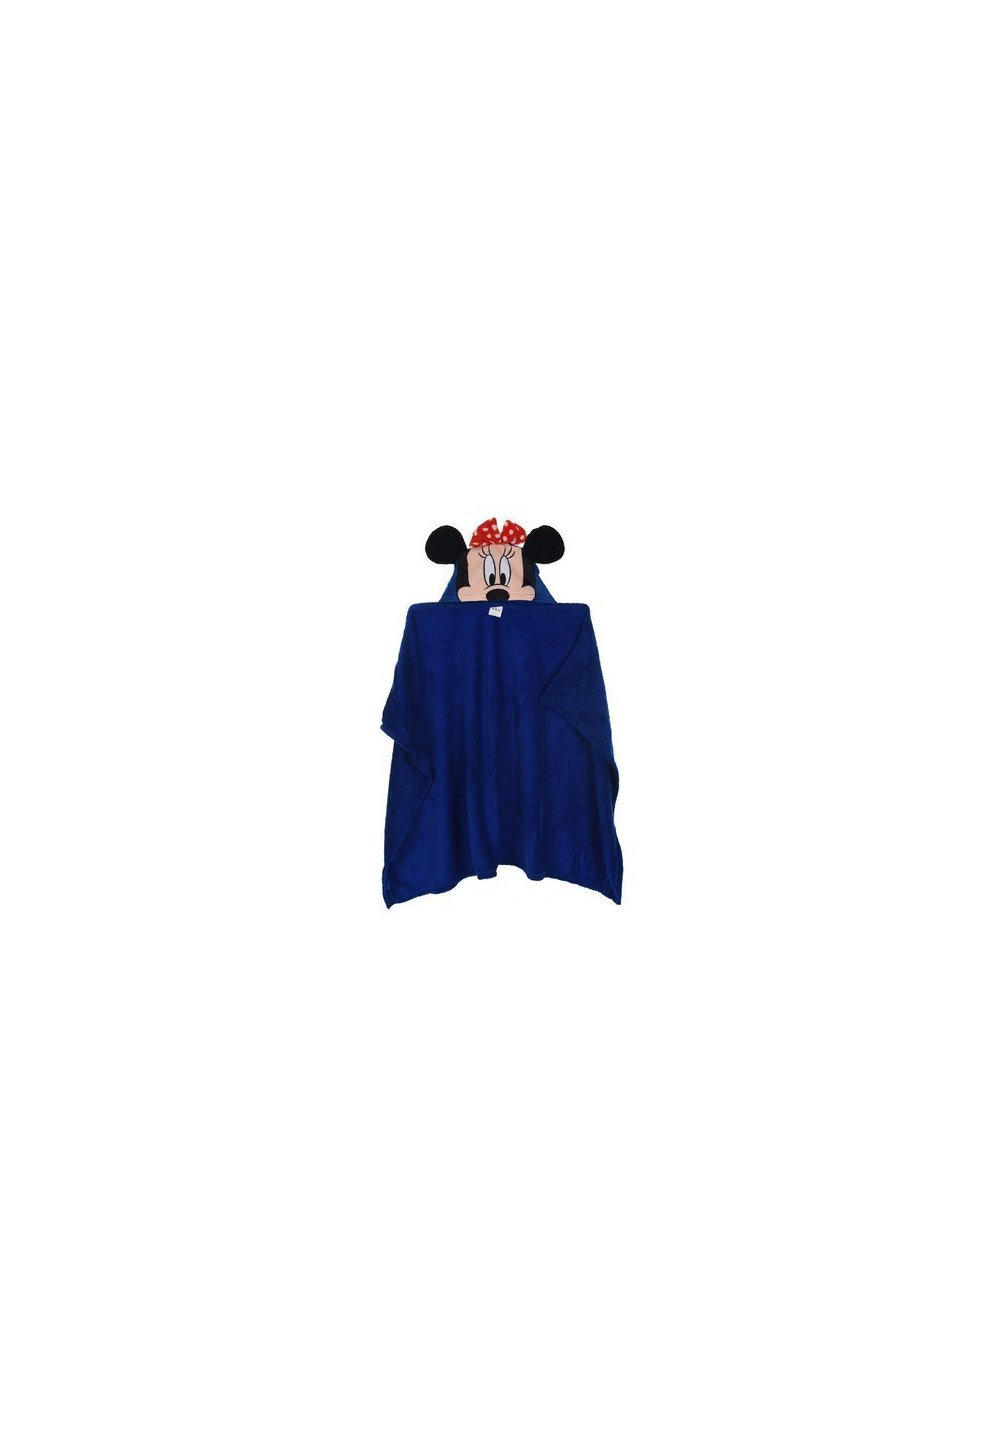 Paturica cu gluga, Minnie Mouse, albastra, 80x120cm imagine